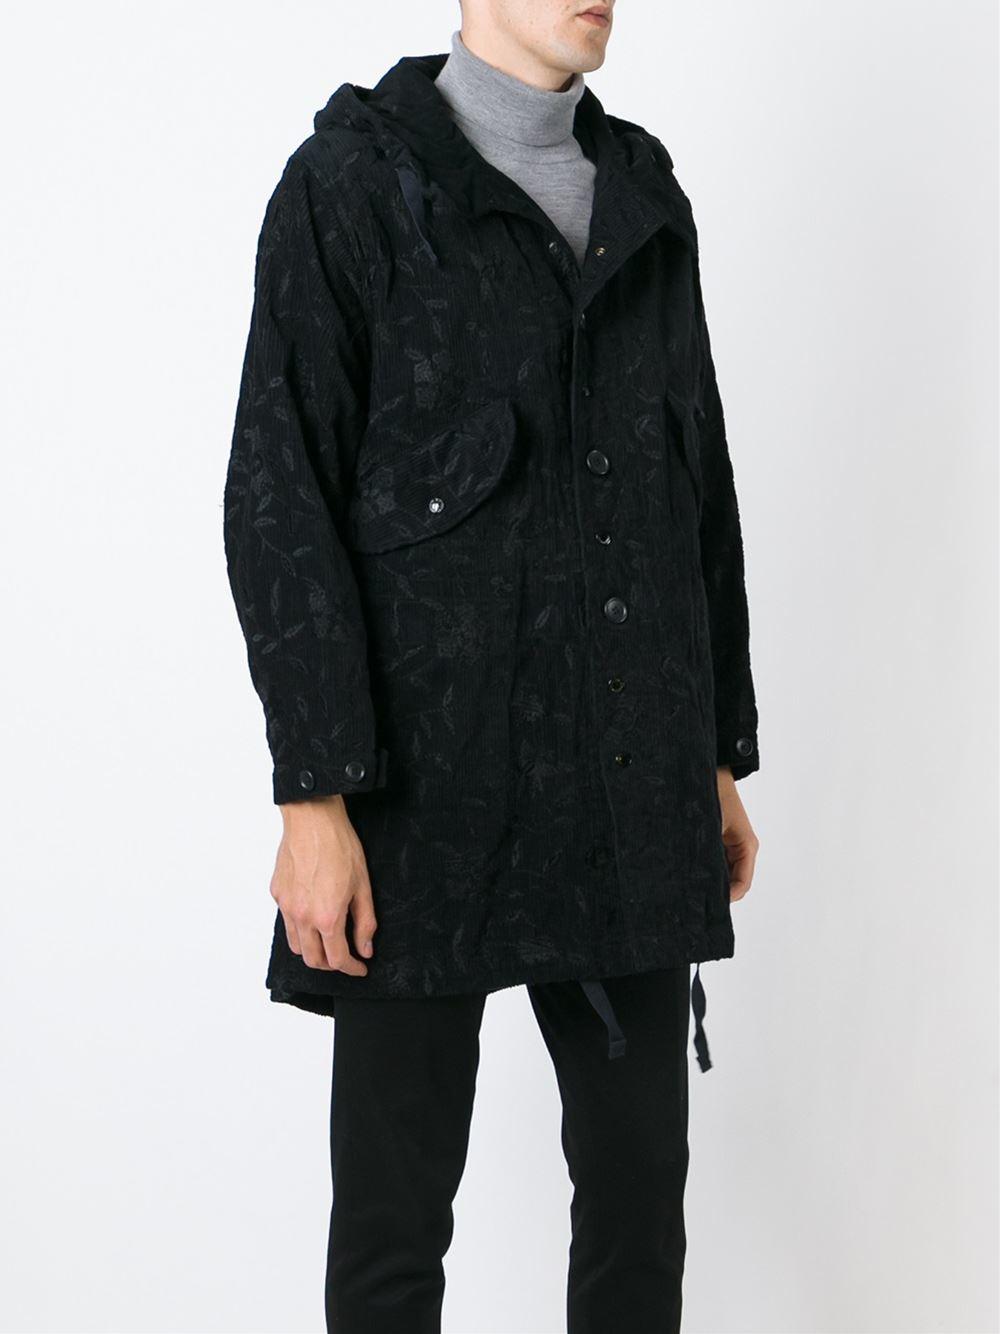 Engineered Garments Floral Corduroy Parka in Black for Men